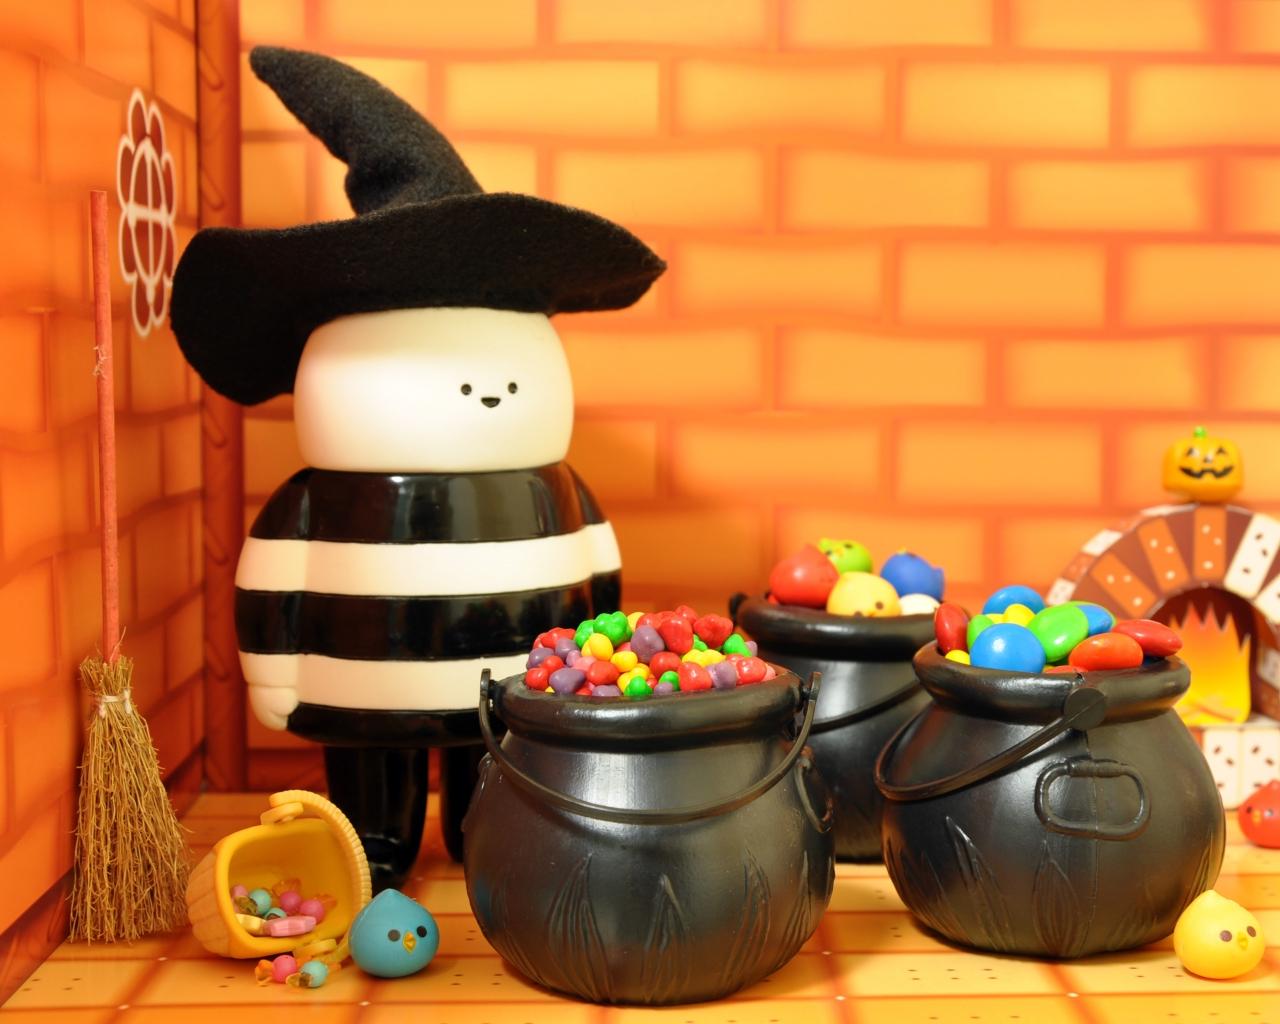 Dulces para Halloween - 1280x1024